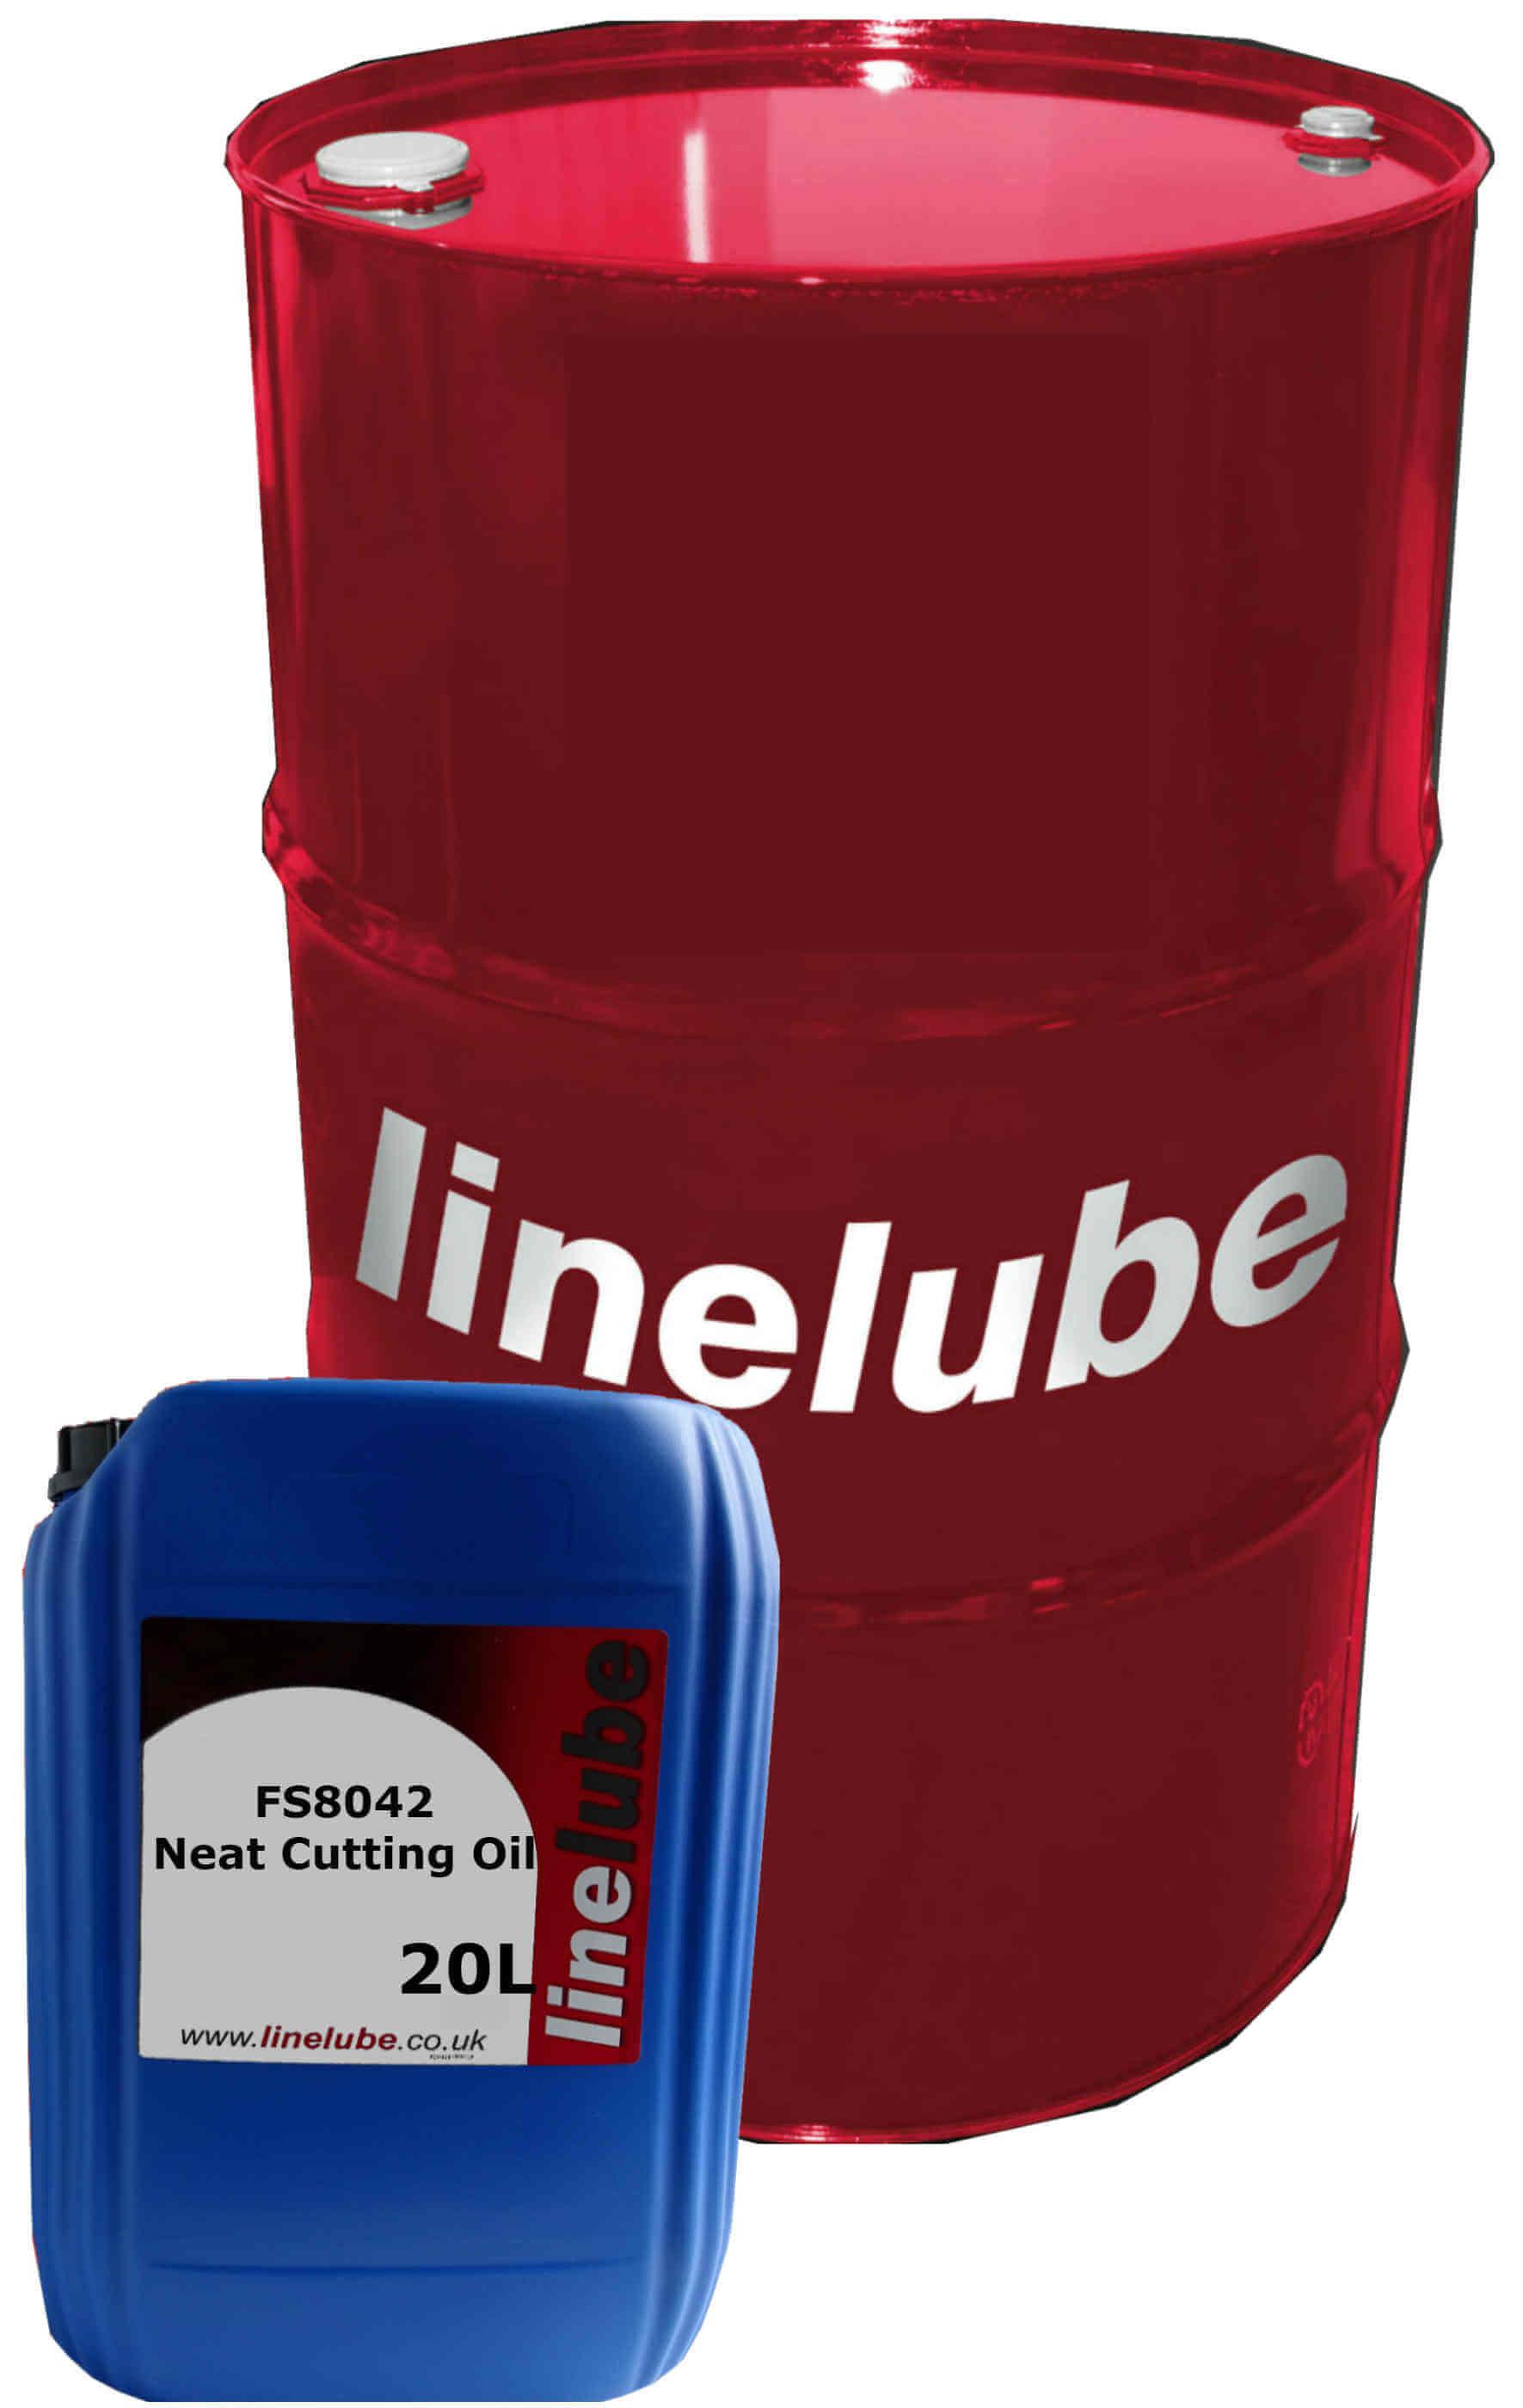 Linelube FS8042 Neat Cutting Oil